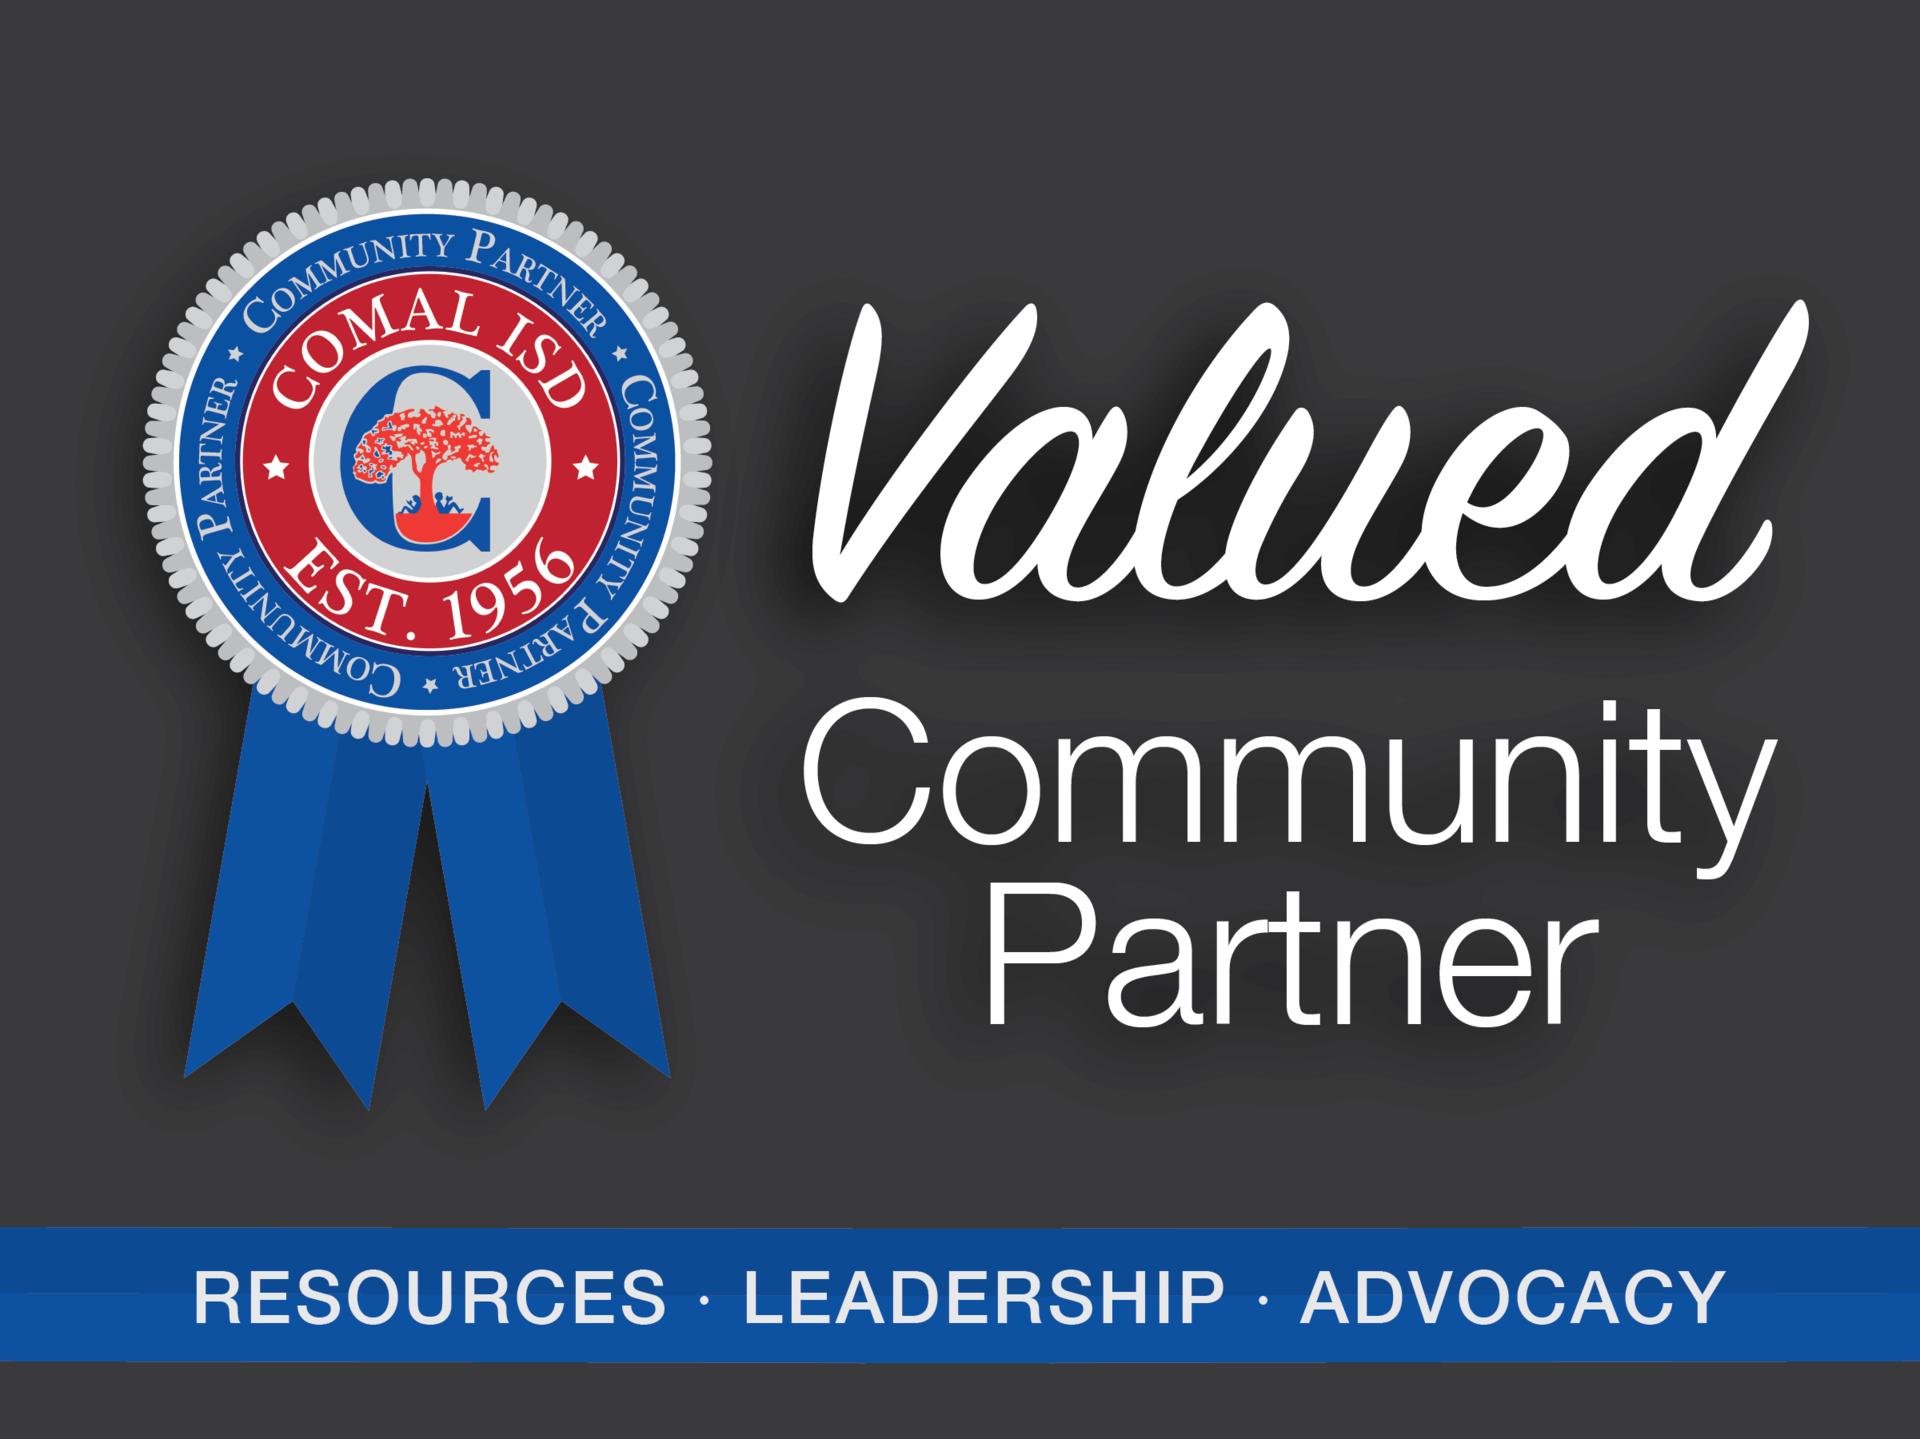 Valued Community Partner